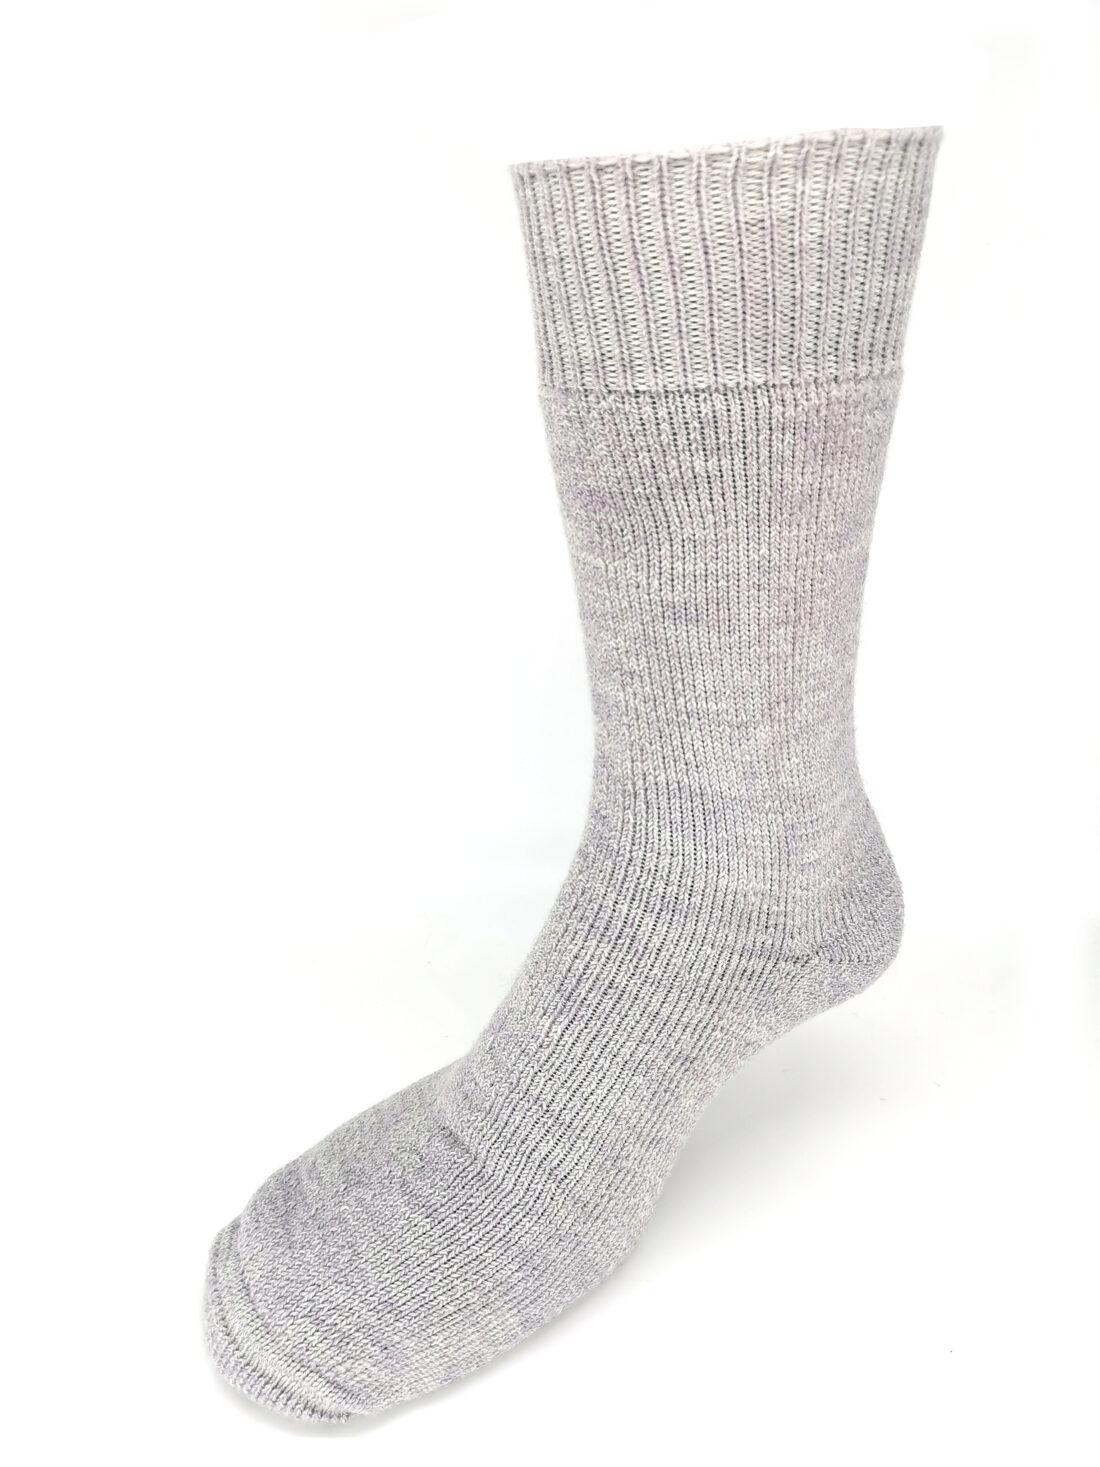 Lilac cricket wool socks